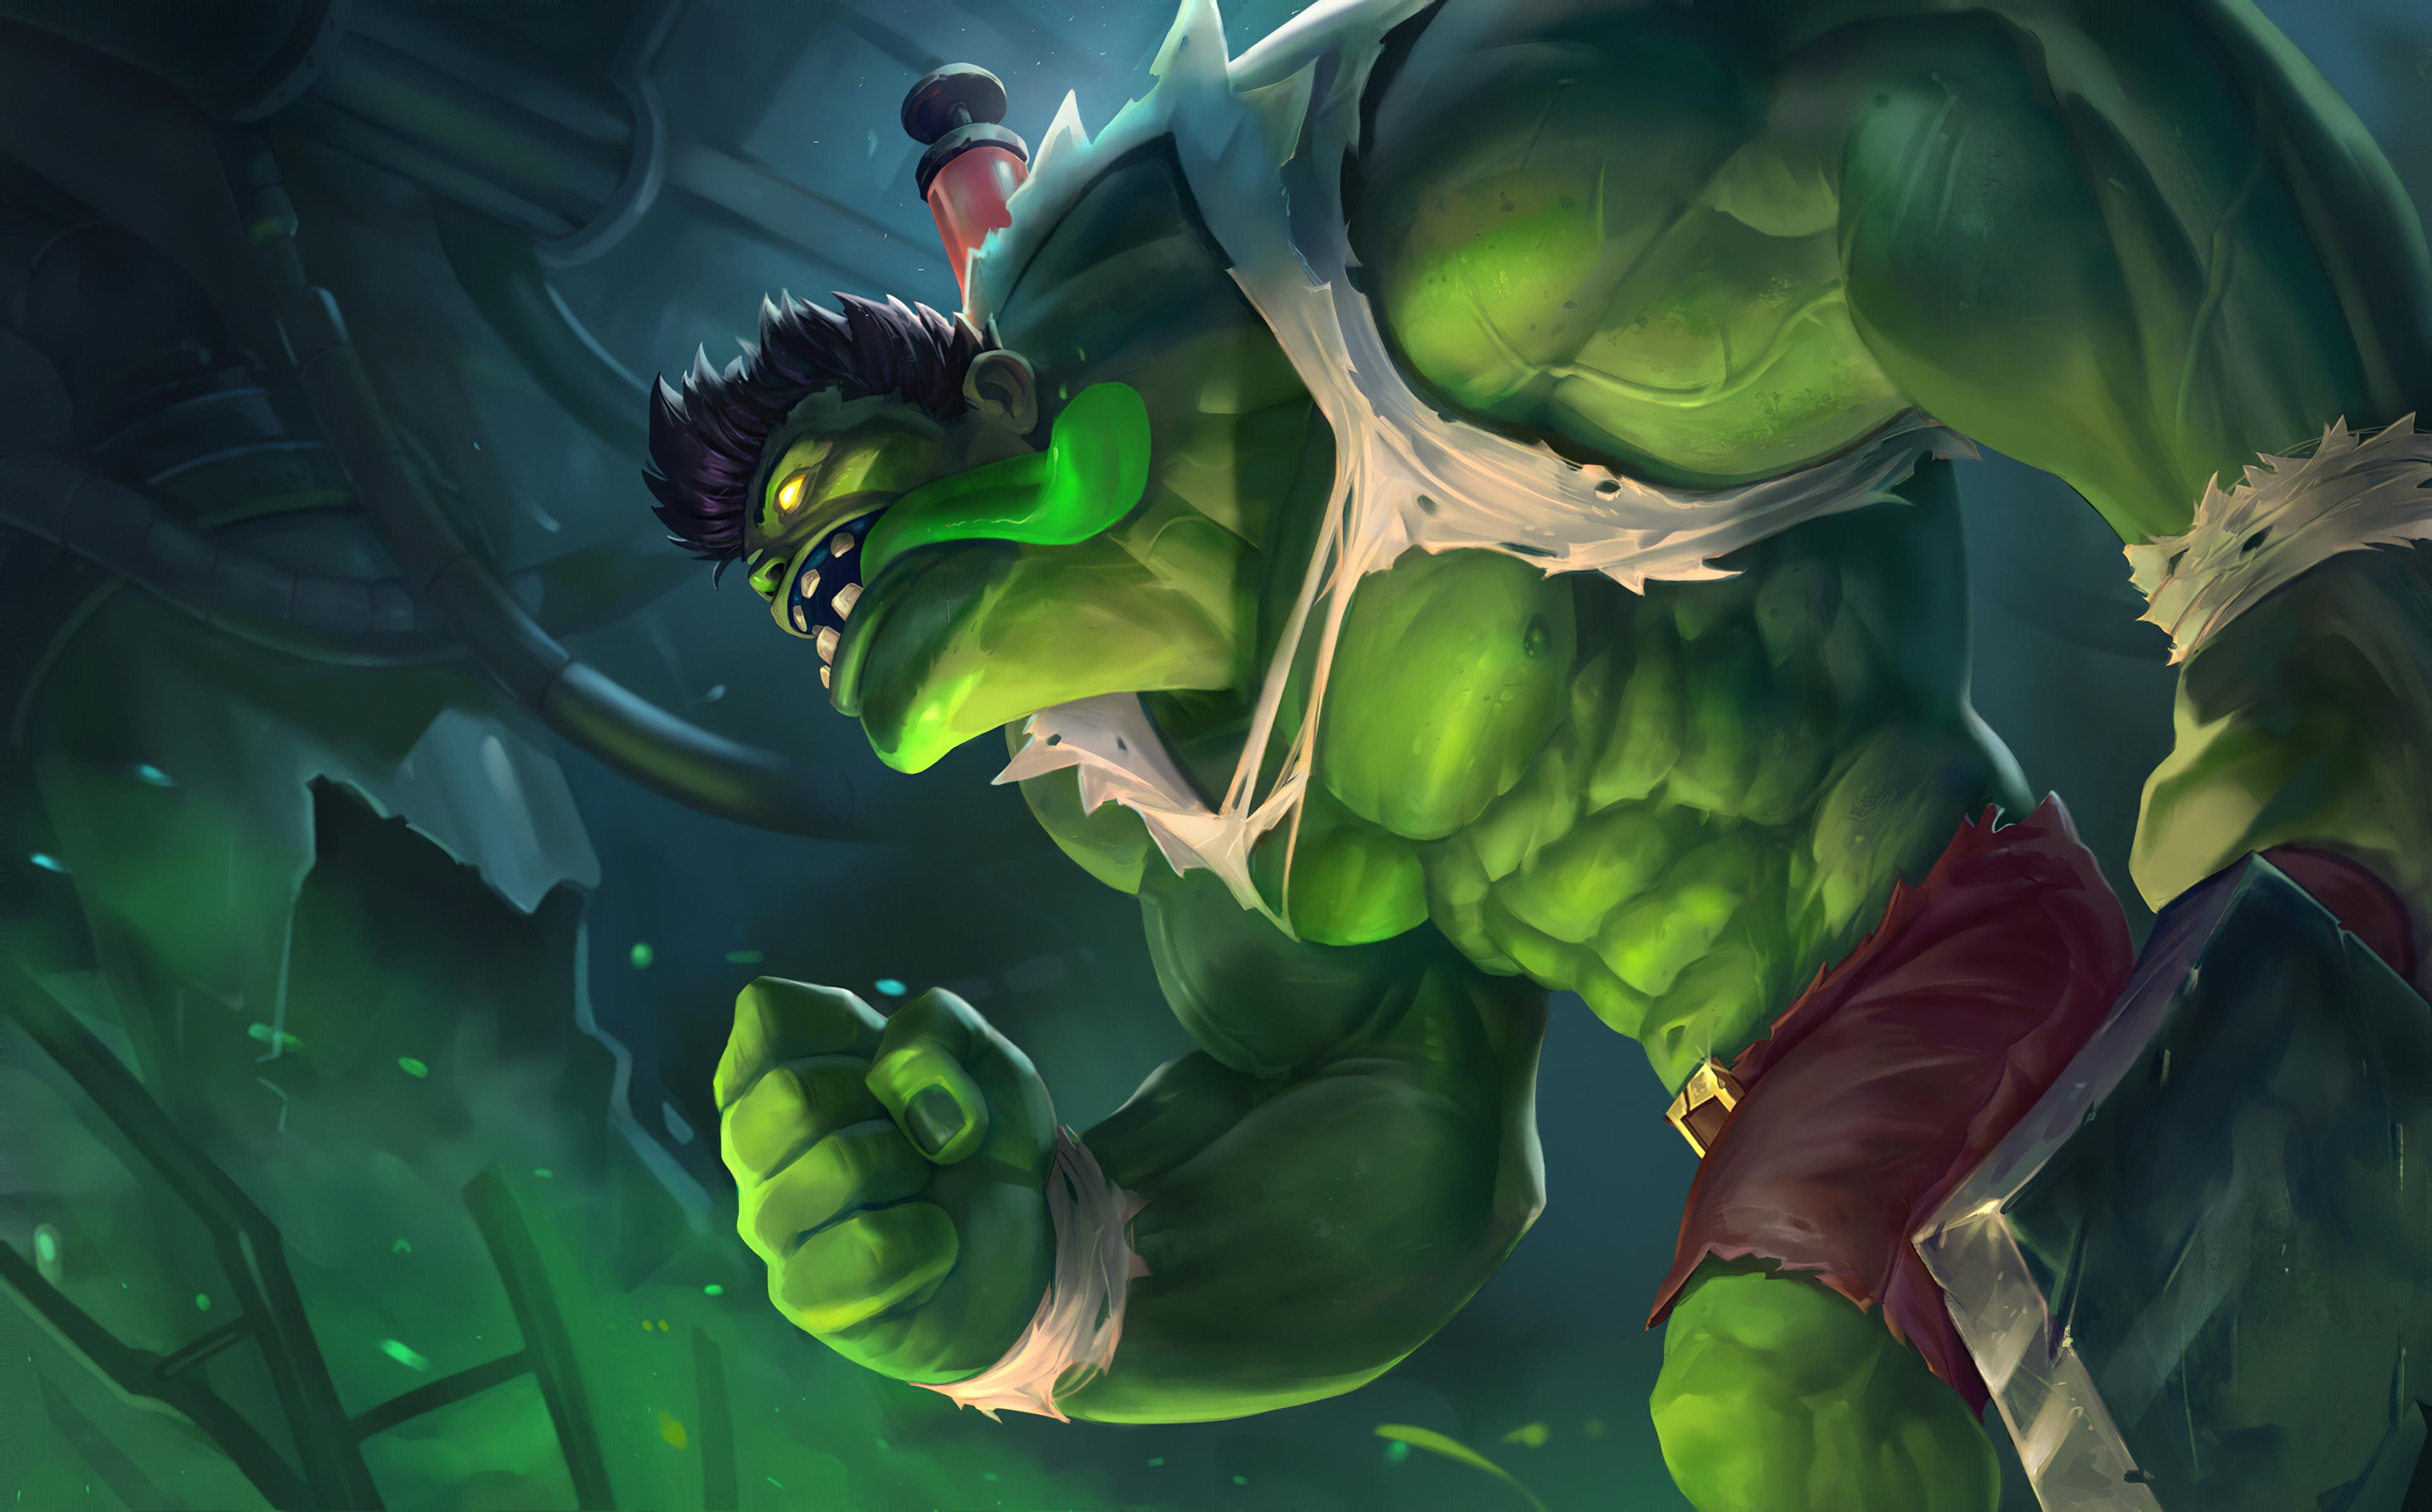 hulk art 1581356167 - Hulk Art - hulk wallpapers, Hulk superhero wallpapers, Hulk phone wallpapers 4k, Hulk 4k wallpapers